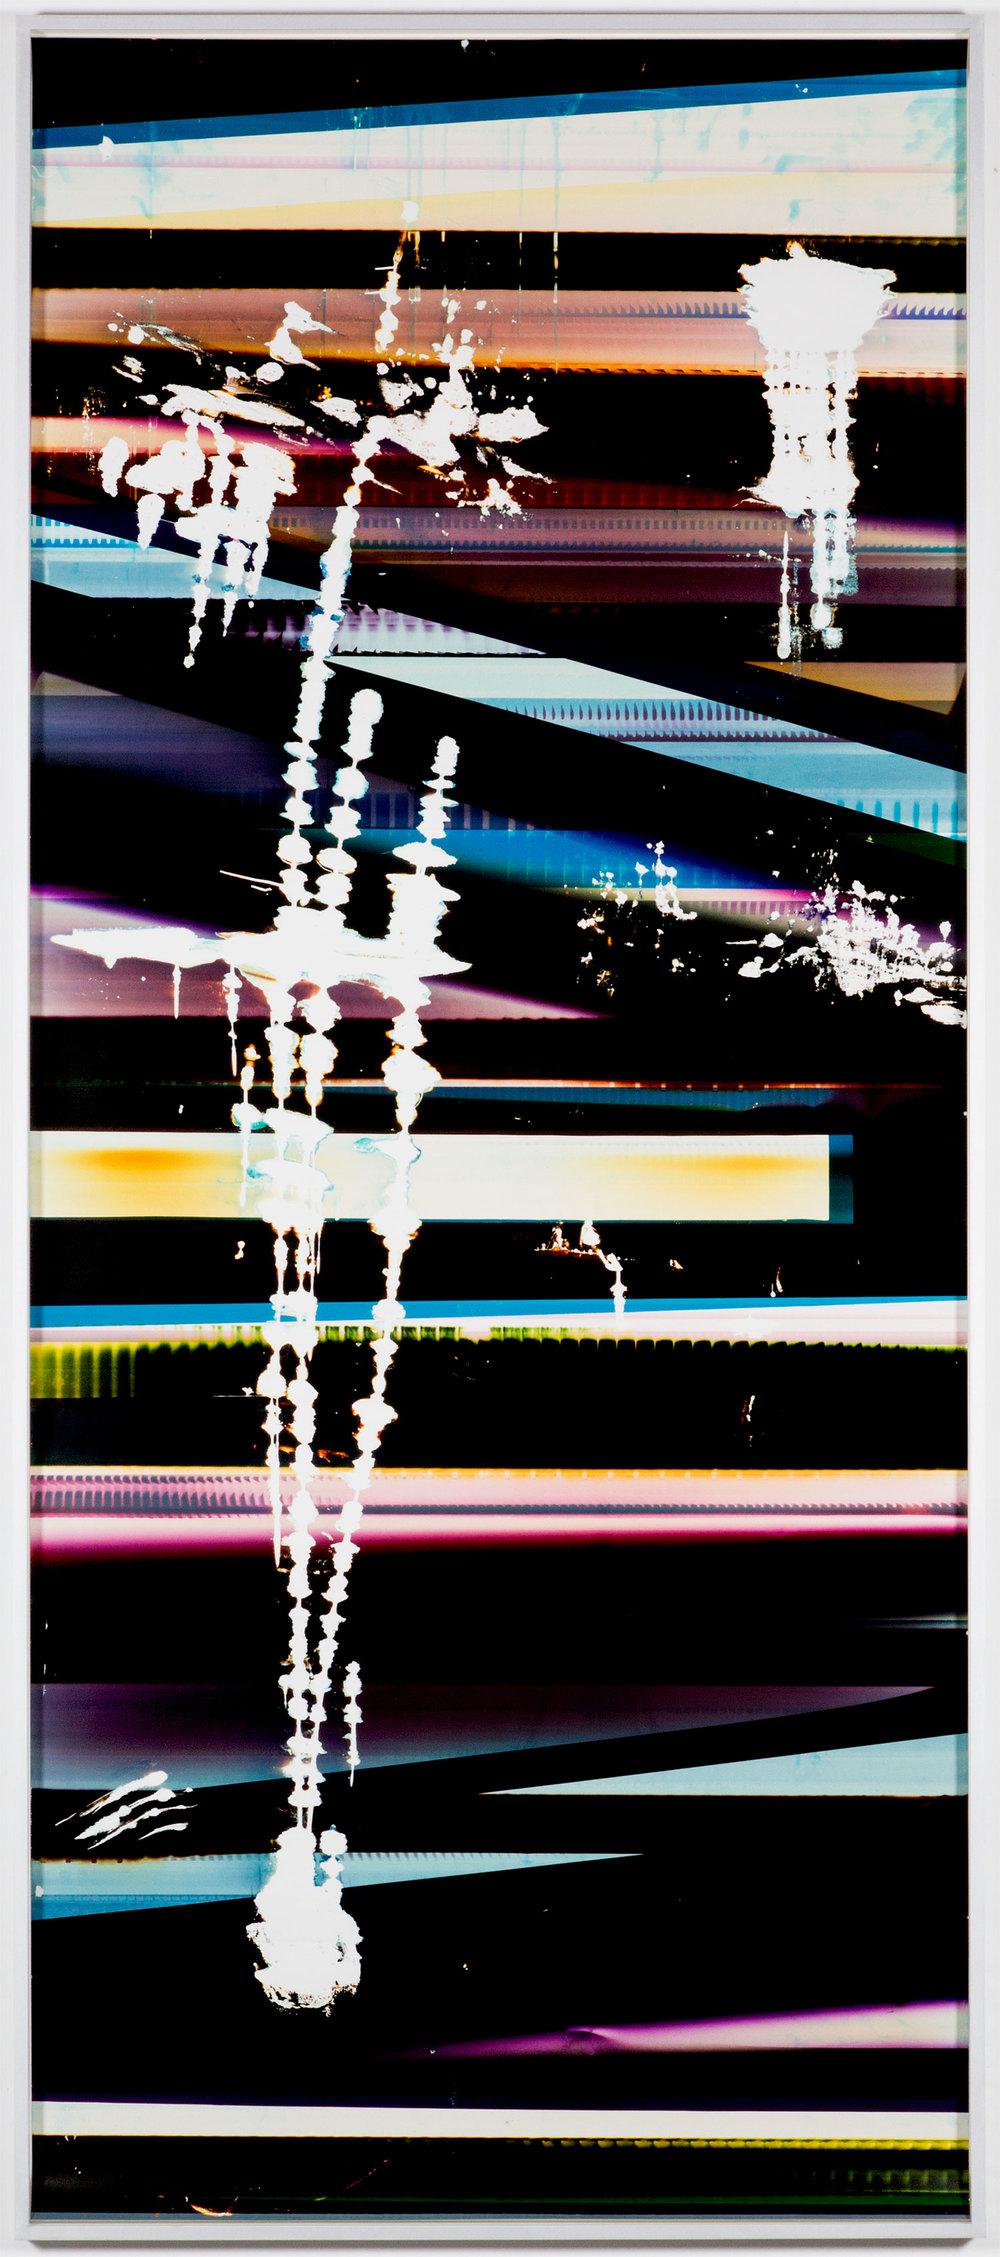 Cross-Contaminated RA4 Contact Print [Black Curl (9:6/CYM/Six Magnet: Los Angeles, California, January 27, 2014, Fuji Color Crystal Archive Super Type C, Em. No. 101-006, Kodak Ektacolor RA Bleach-Fix and Replenisher, Cat. No. 847 1484, 06214), Kreonite KM IV 5225 RA4 Color Processor, Ser. No. 00092174]    2016   Color photographic paper  119 3/4 x 51 1/2 inches   Automat, 2016